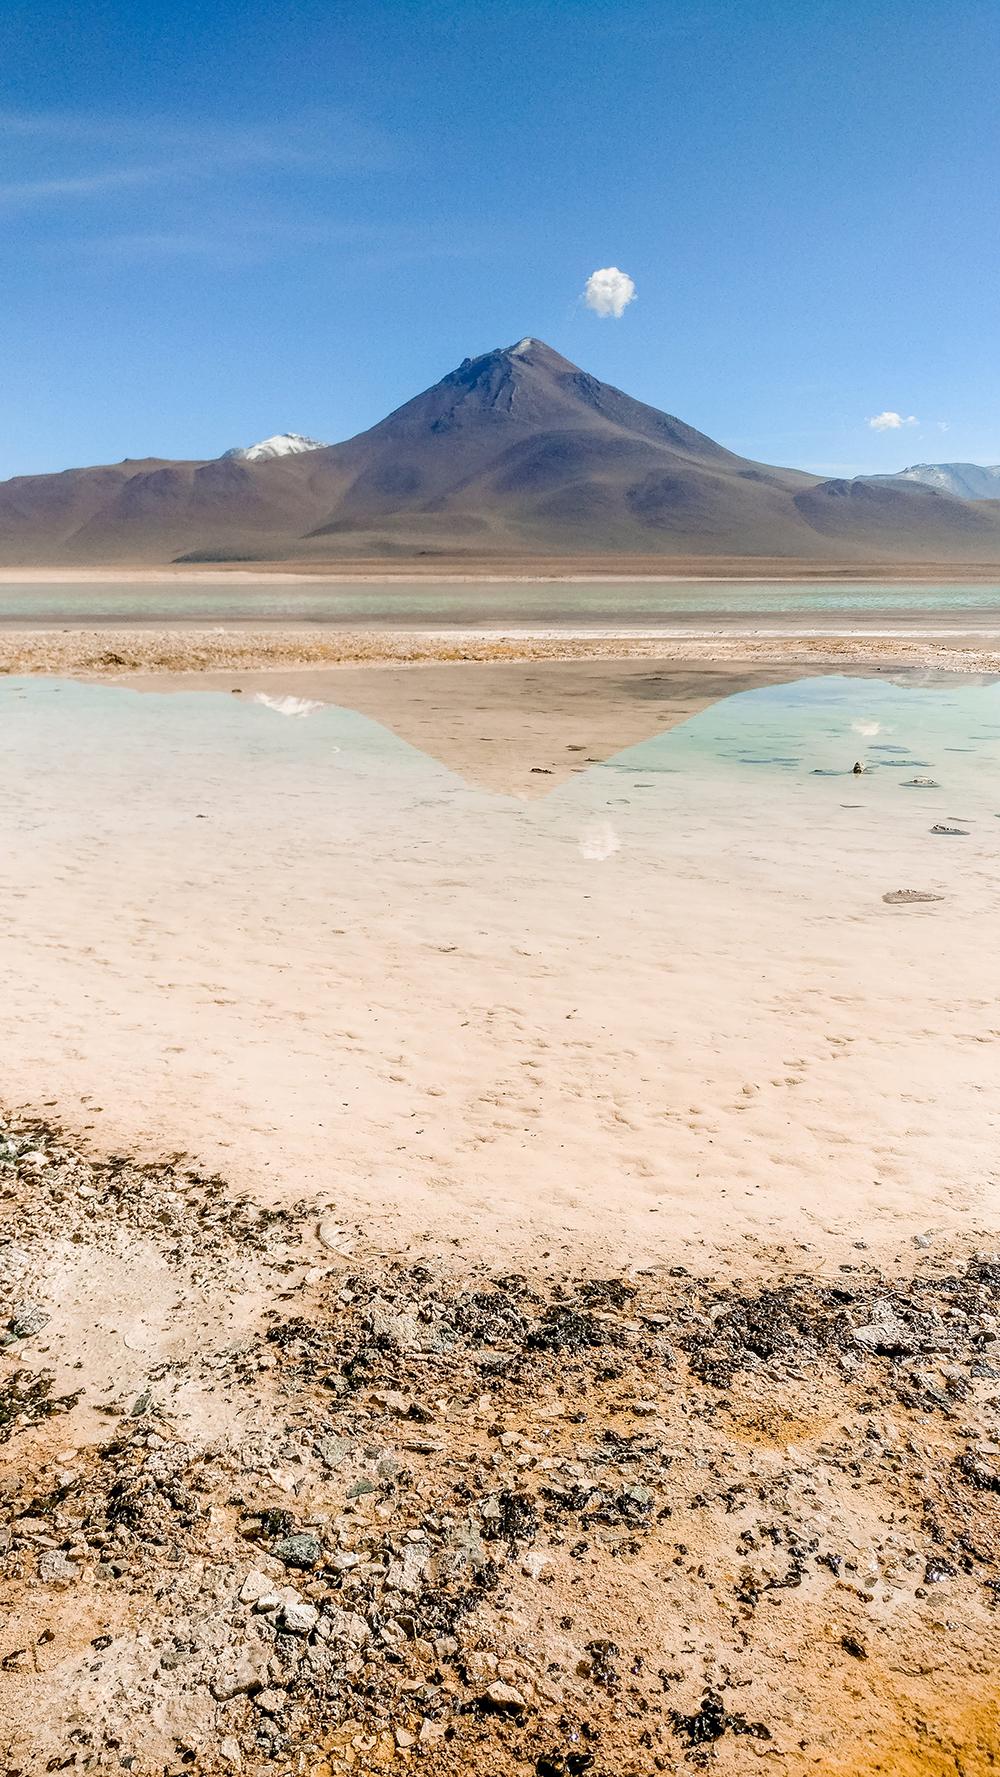 Laguna Blanca (White Lagoon) - How to pick the best Uyuni Salt Flats tour to Bolivia? | Aliz's Wonderland